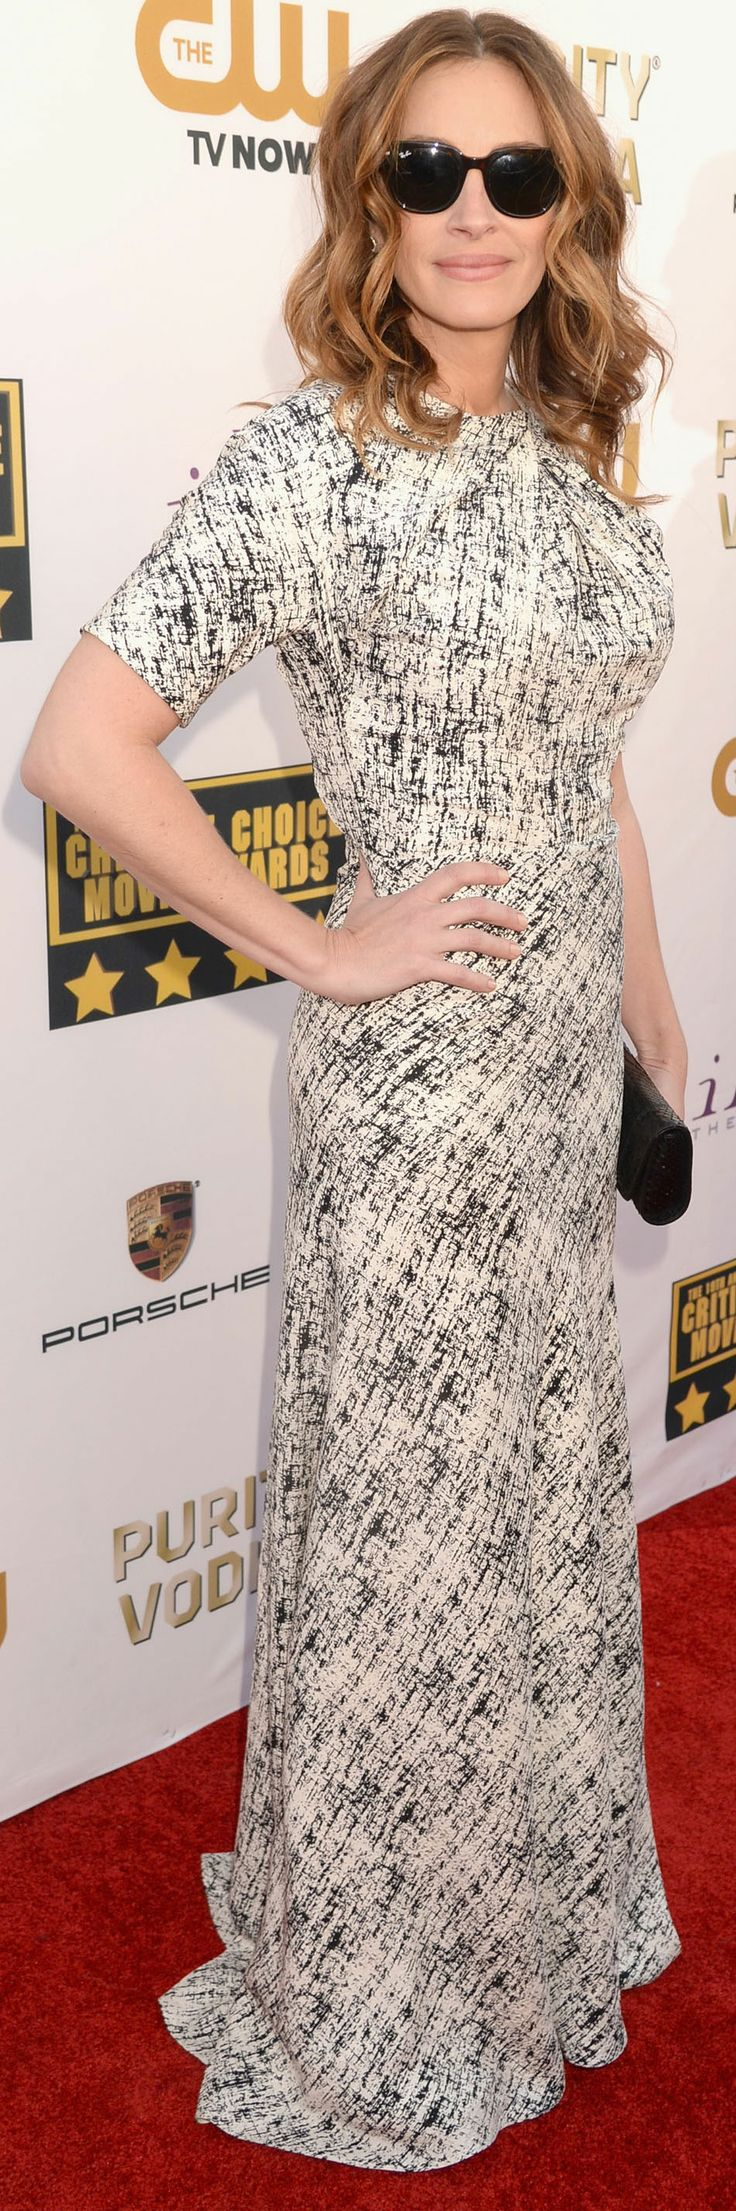 Julia Roberts wore sunglasses on the Critics' Choice Awards red carpet